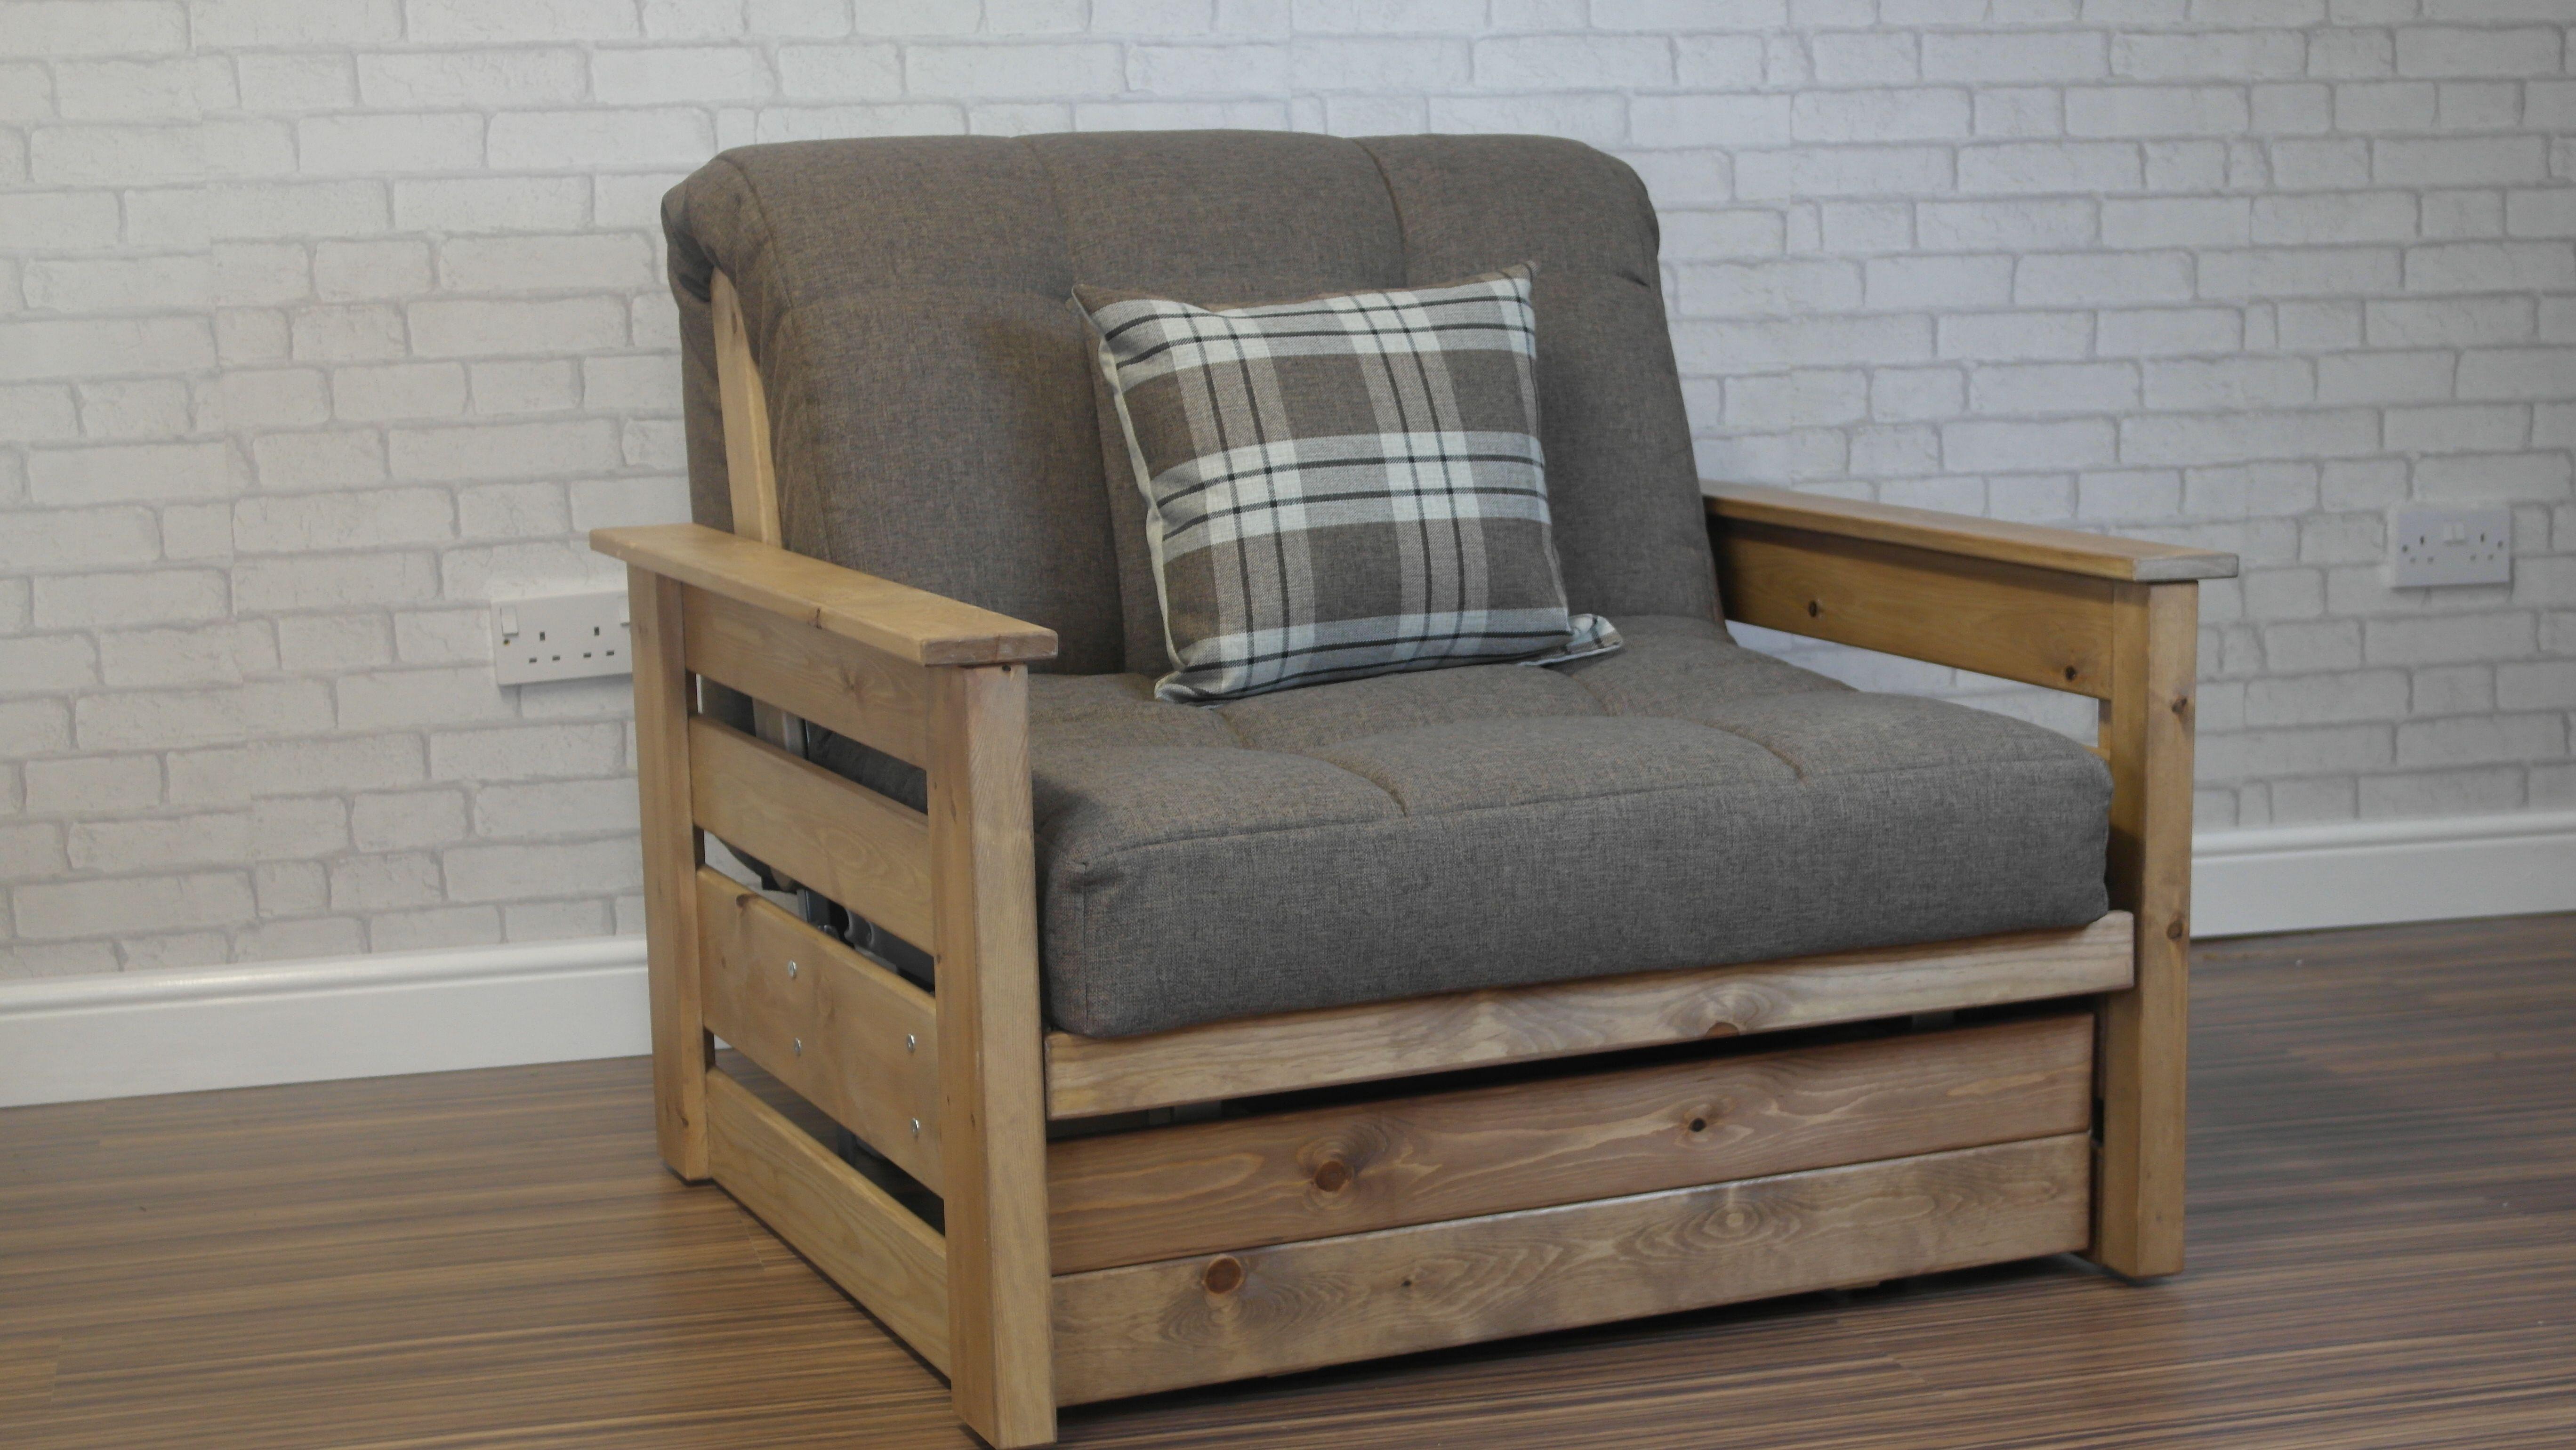 beds ikea sofa erska chair sleeper book the bed and of sofas stefanie